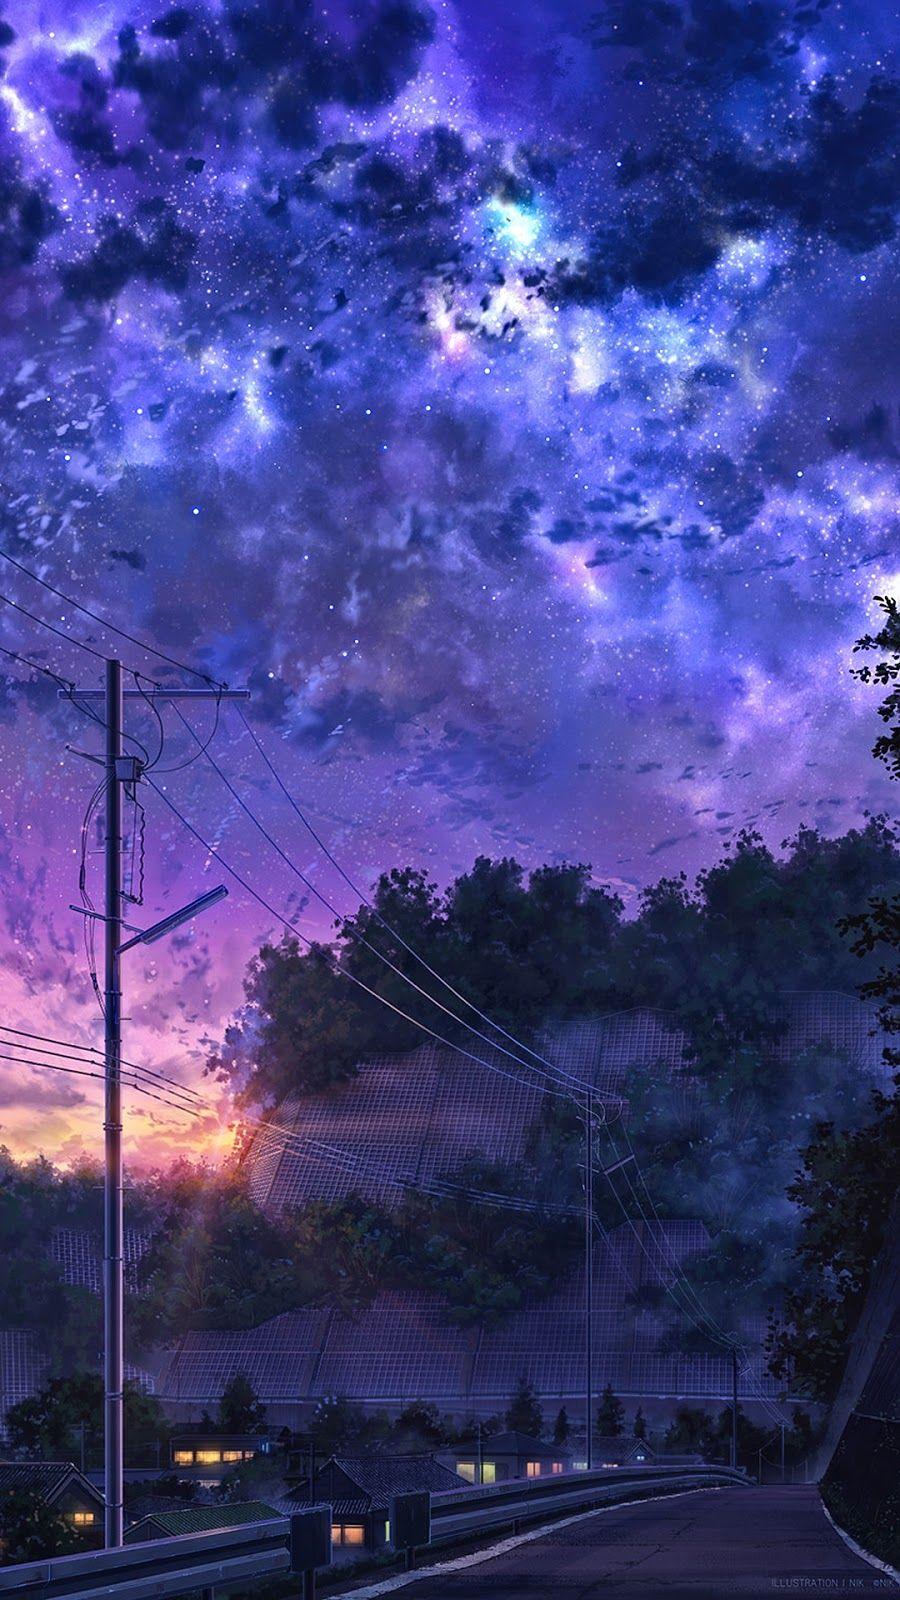 Silent Night lol Scenery wallpaper, Anime scenery